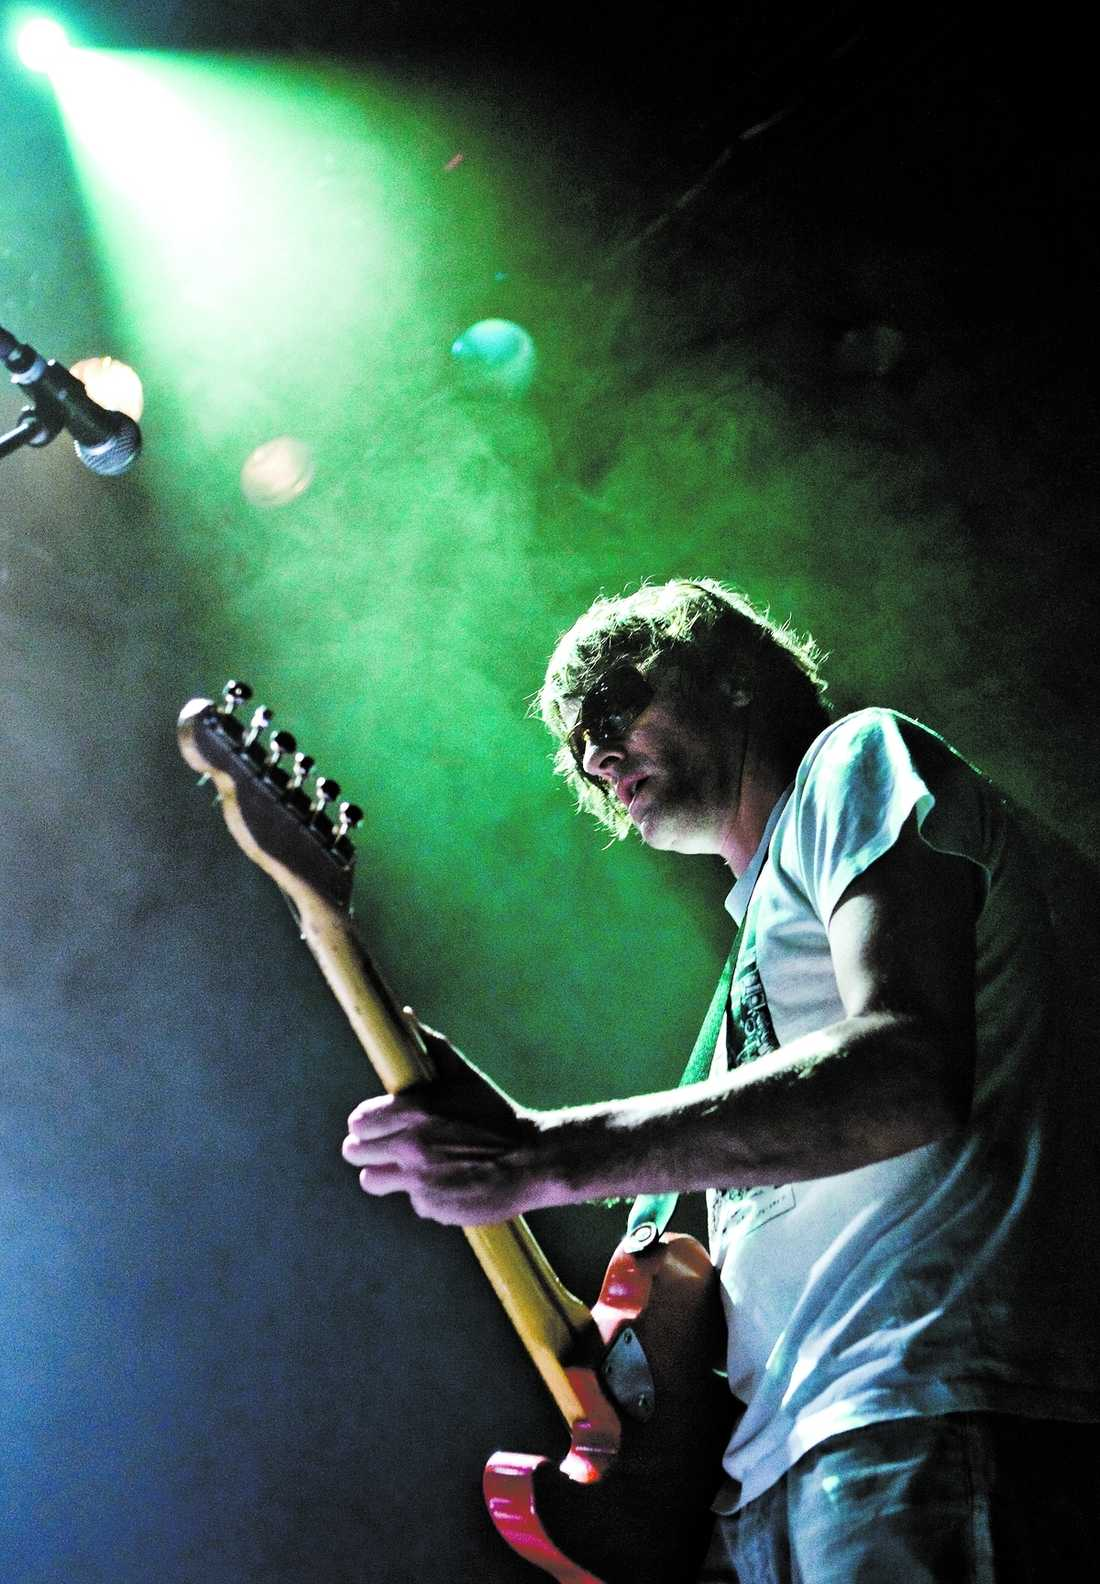 Det finns en kuslig kraft i Jason Pierces rock'n'roll-vision, skriver Håkan Steen.